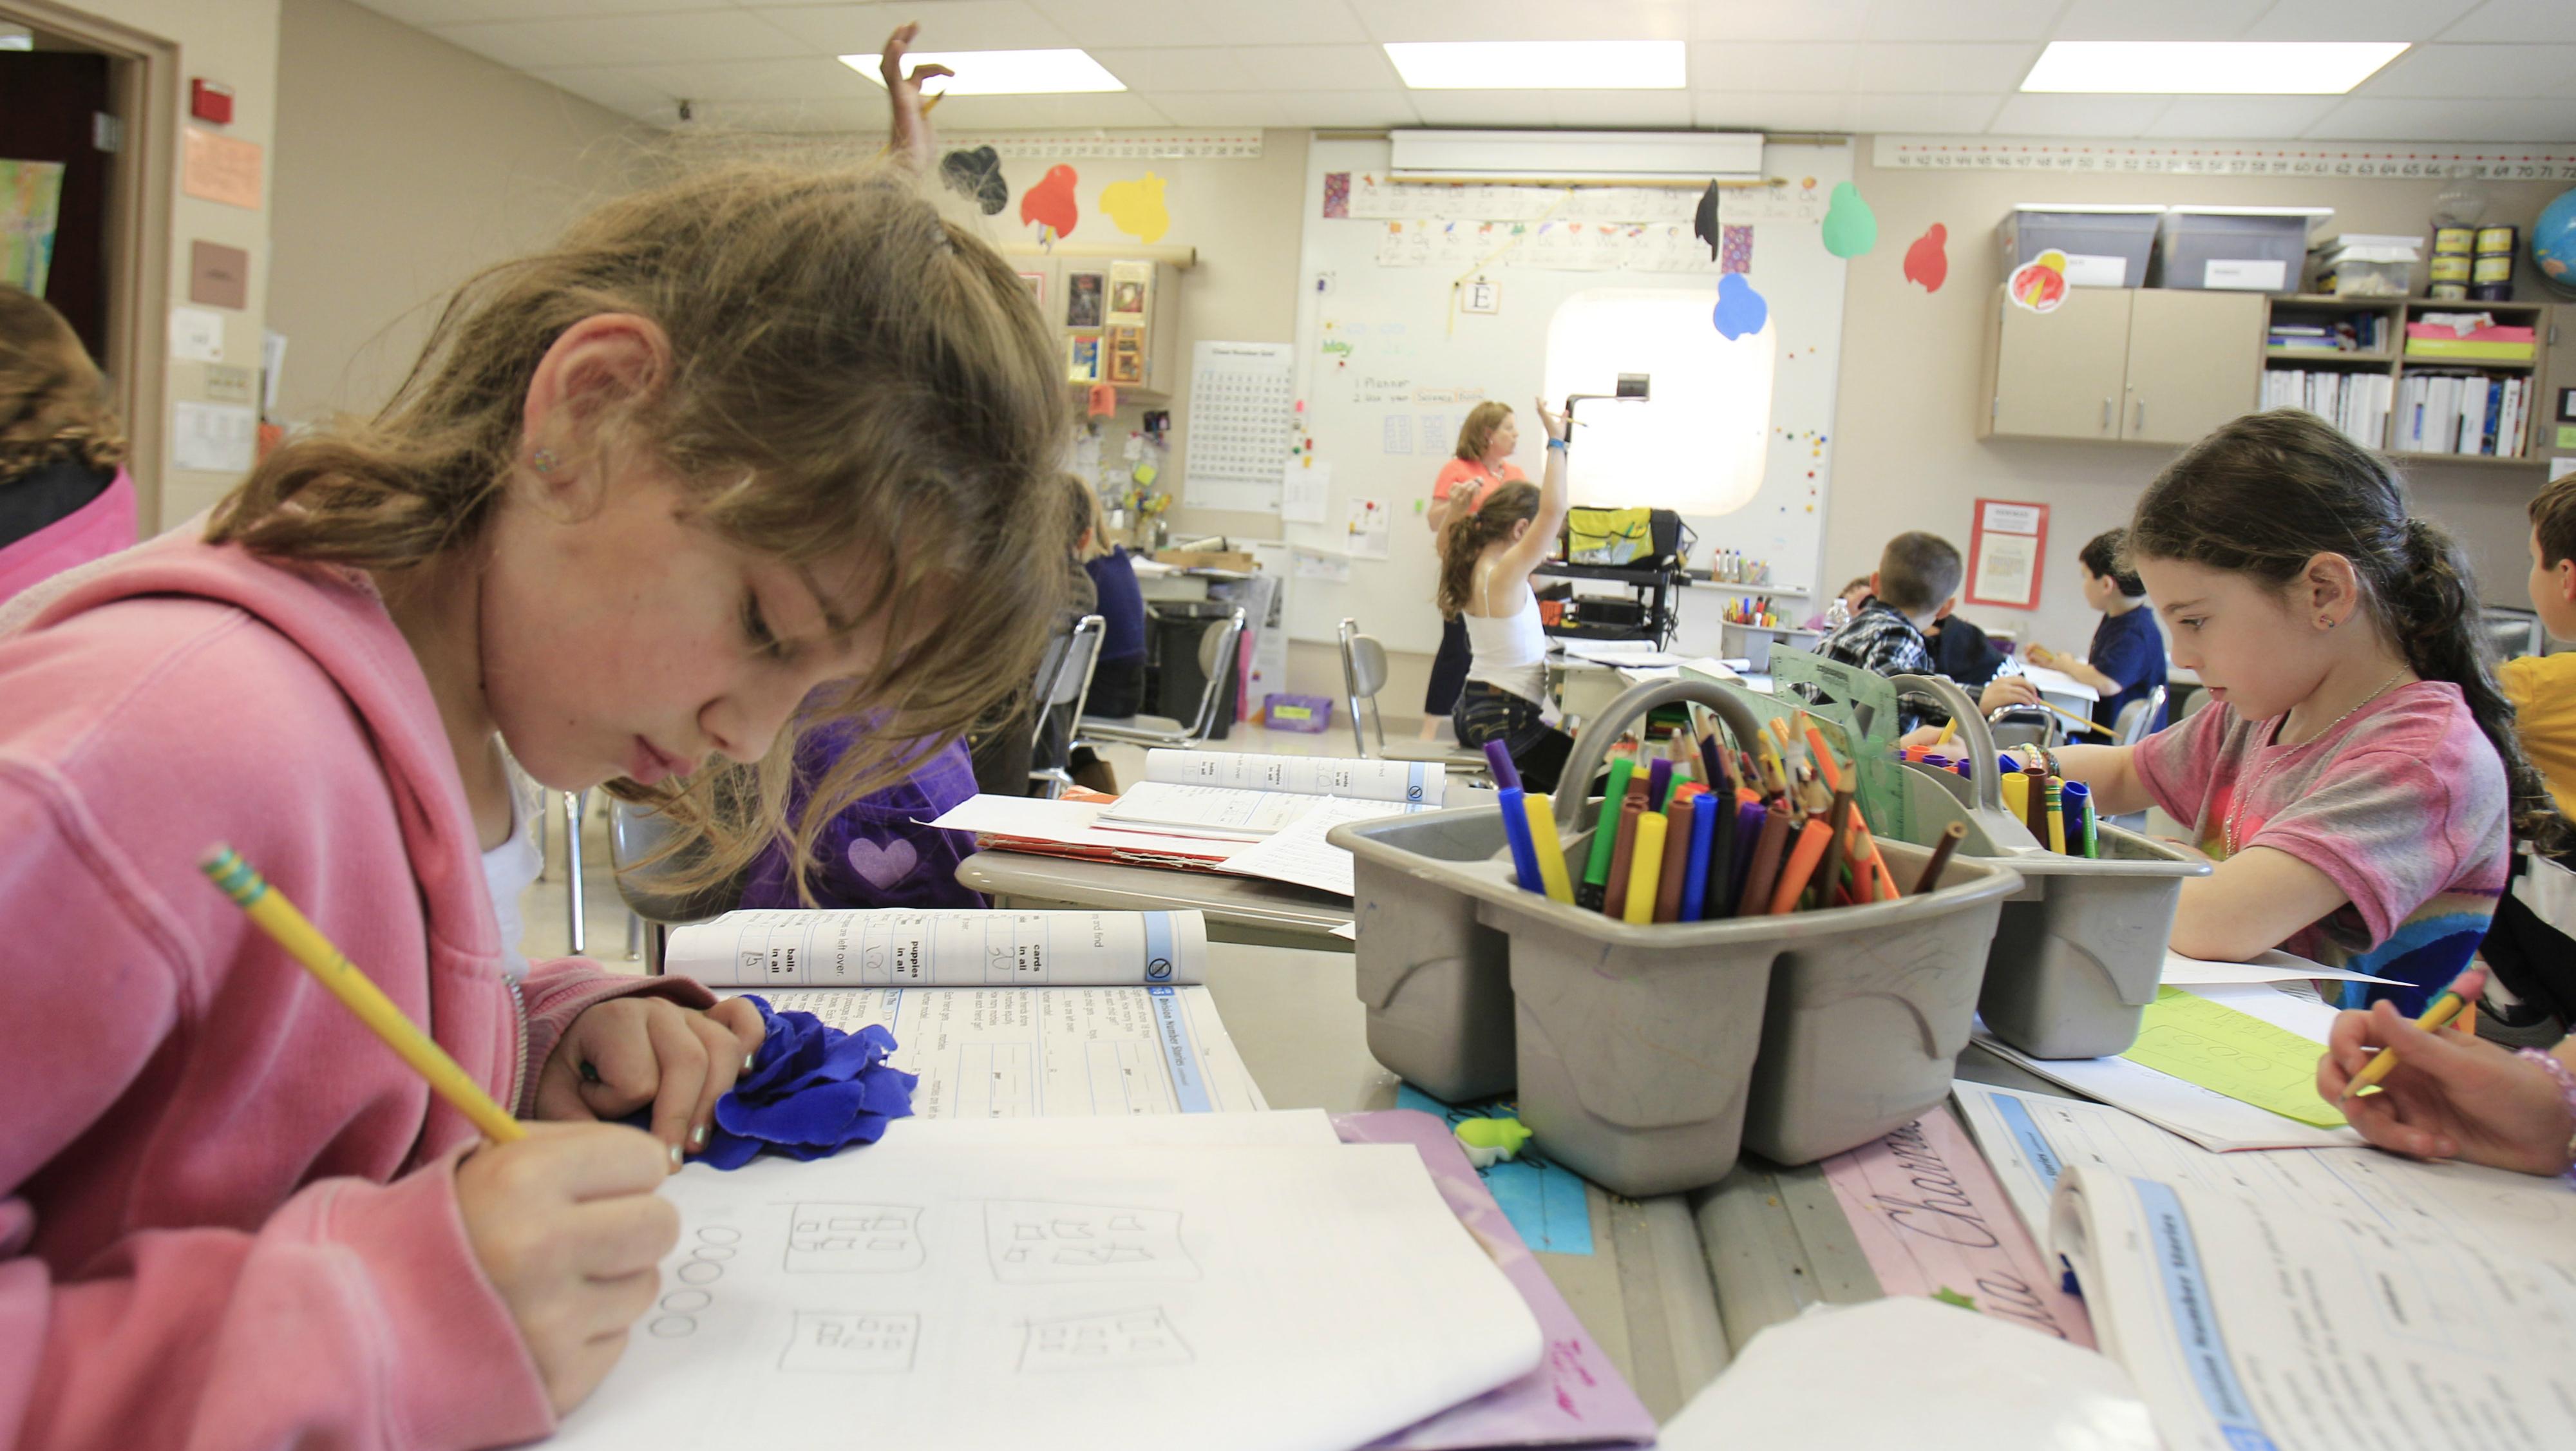 Kids studying math at school.